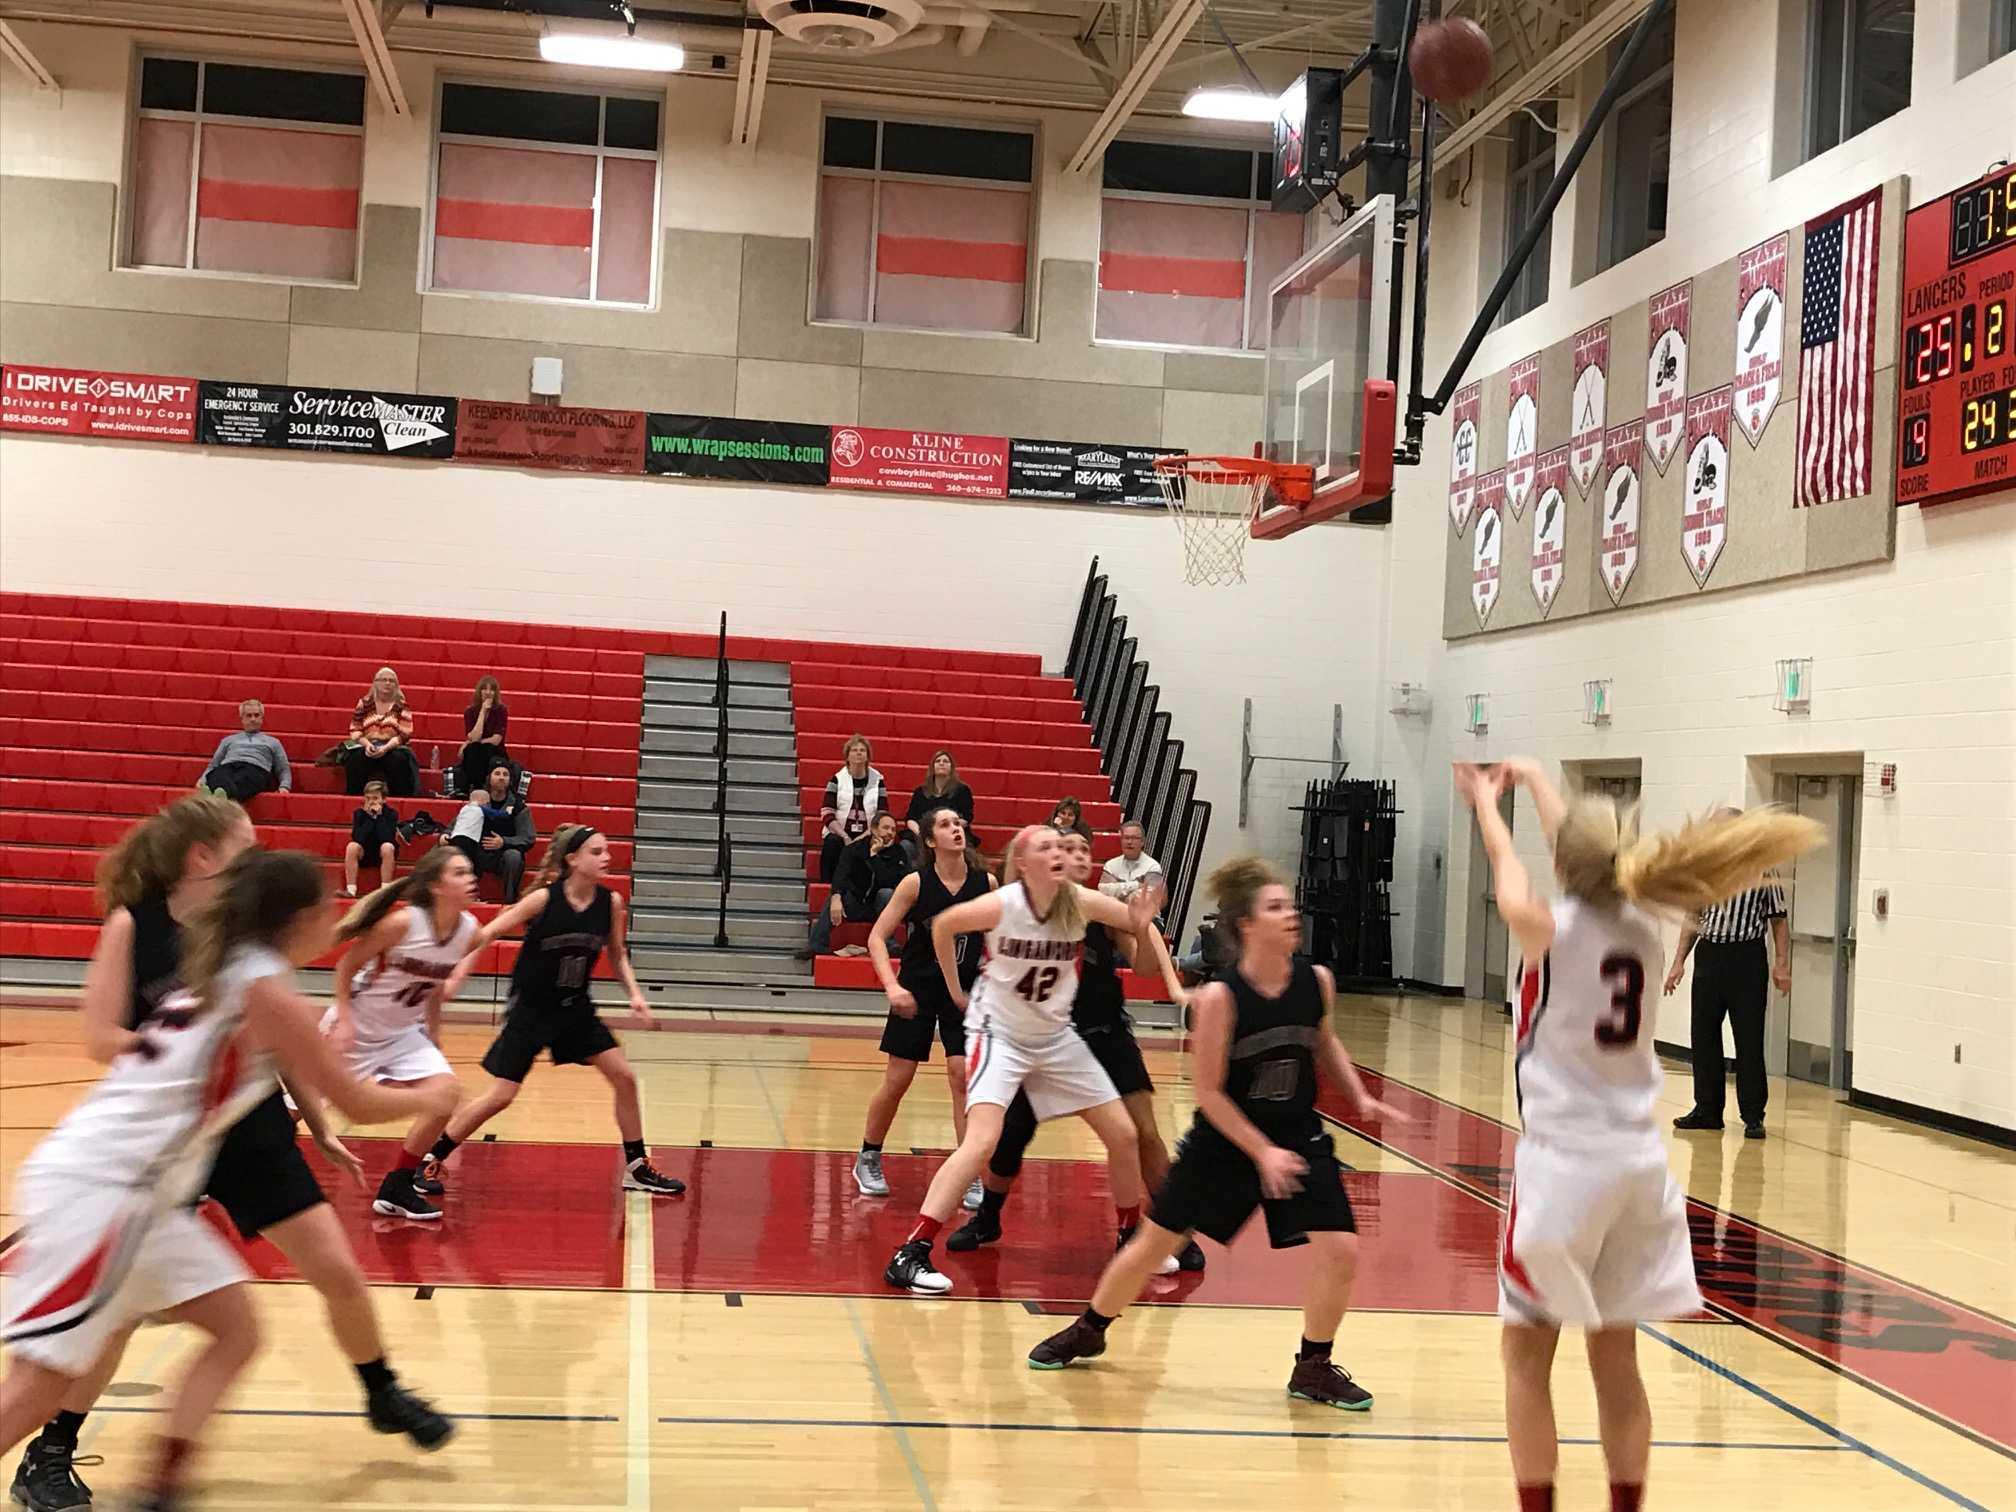 Hannah Ratchford shoots a three point shot.